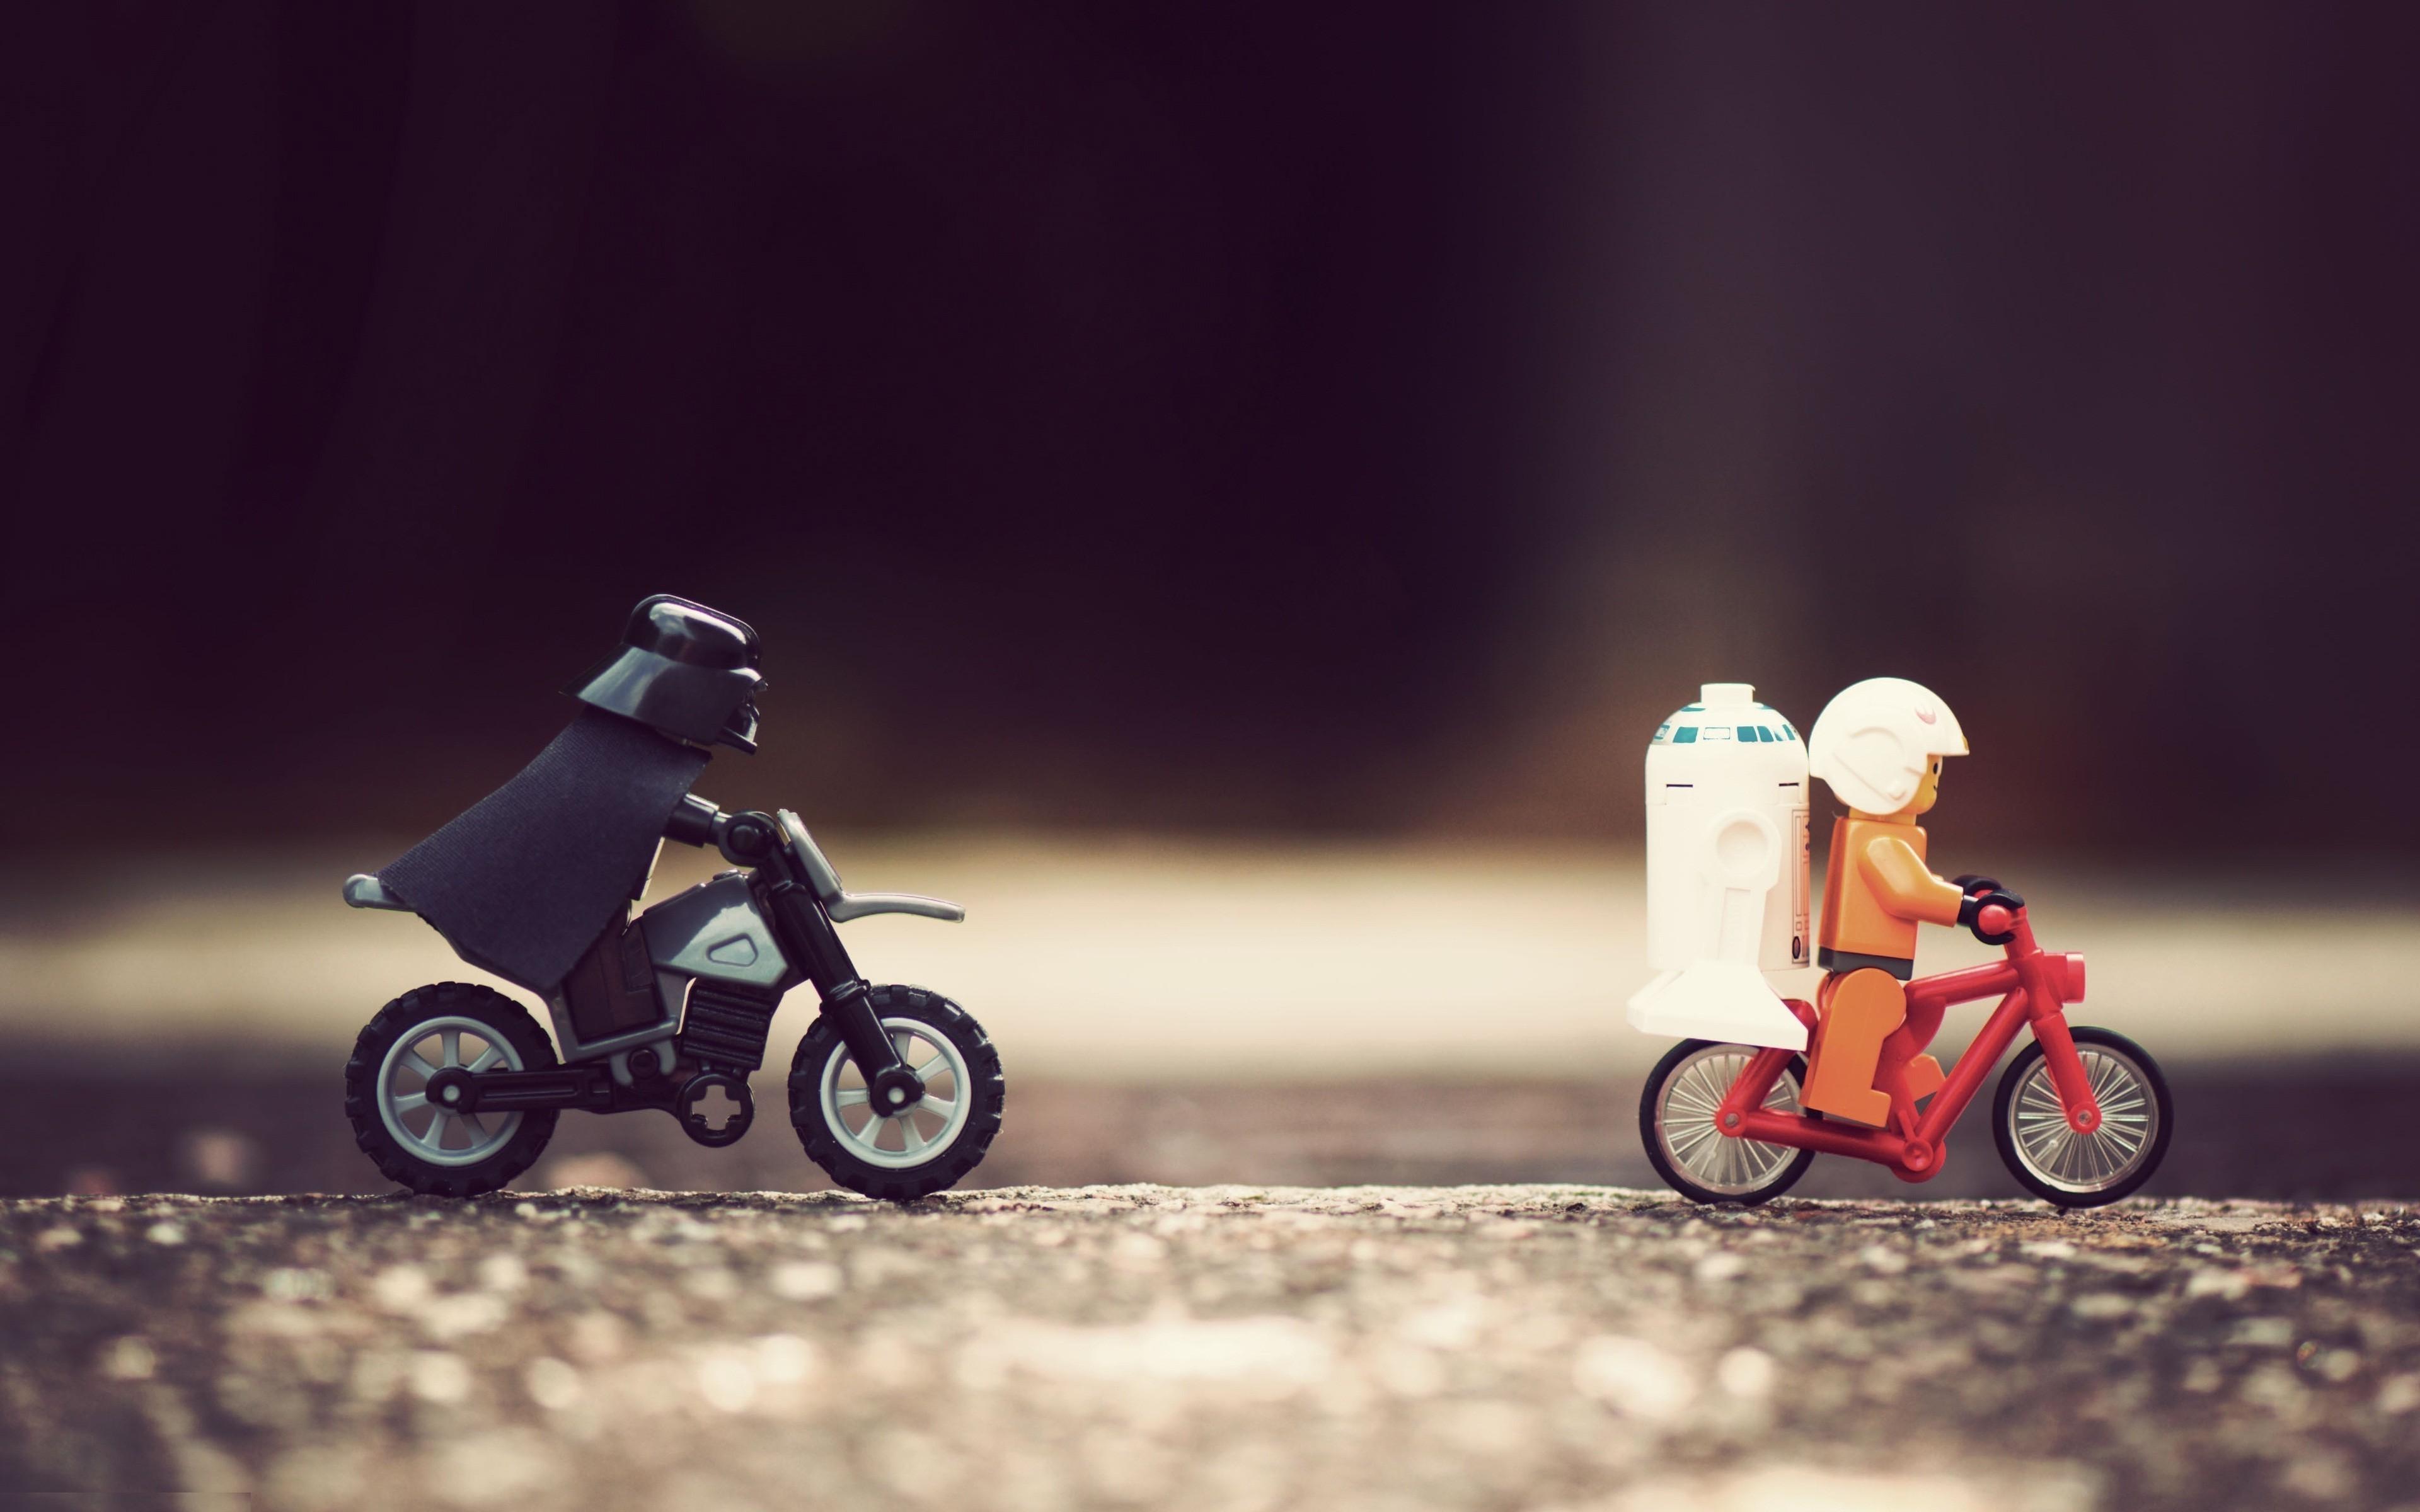 Hintergrundbilder Krieg Der Sterne Fahrrad Motorrad Fahrzeug